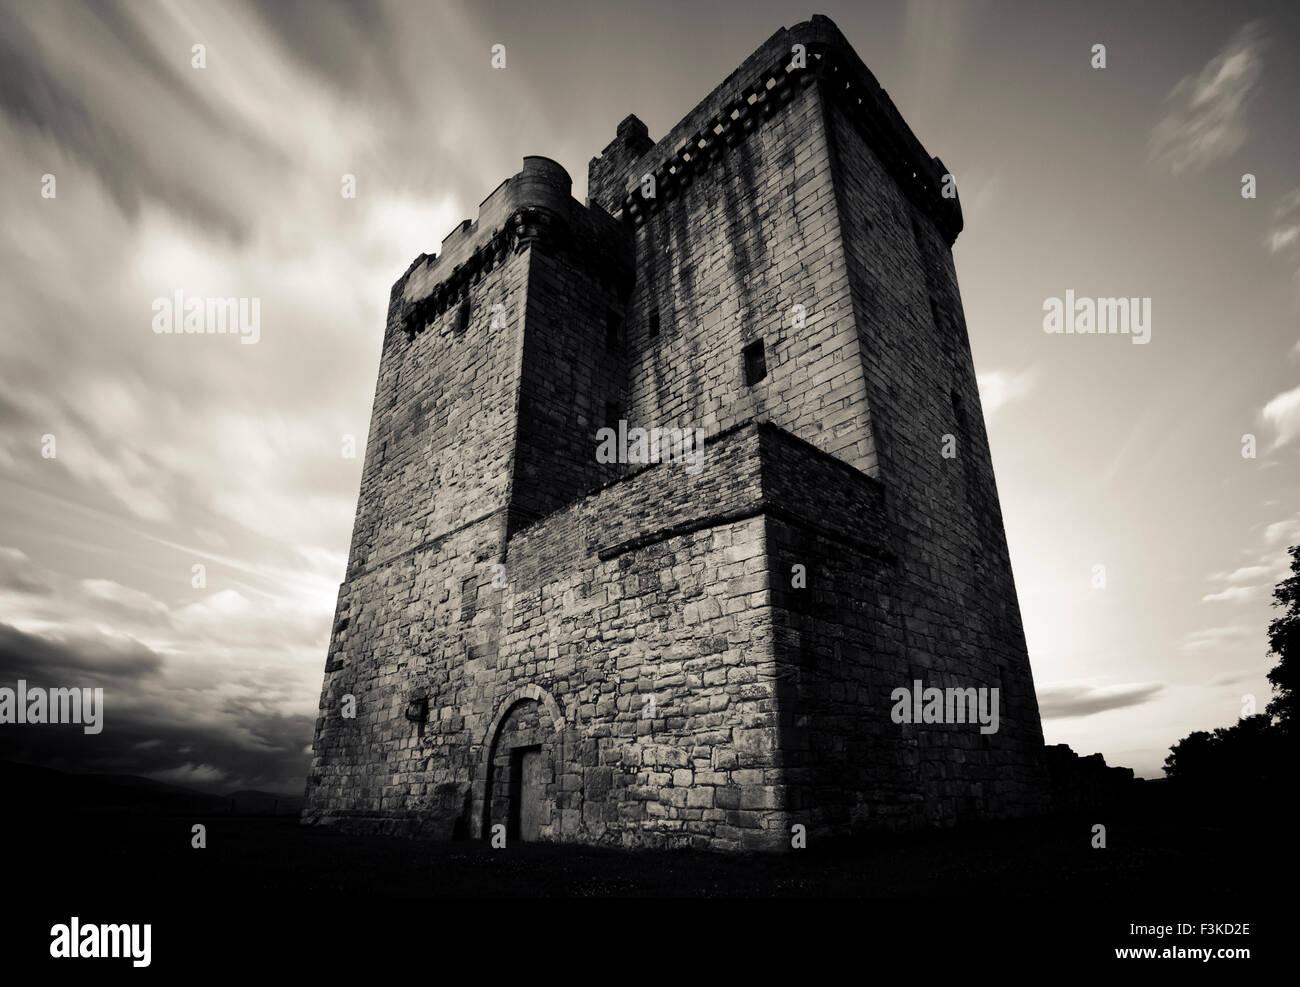 Clackmannan Tower - Stock Image